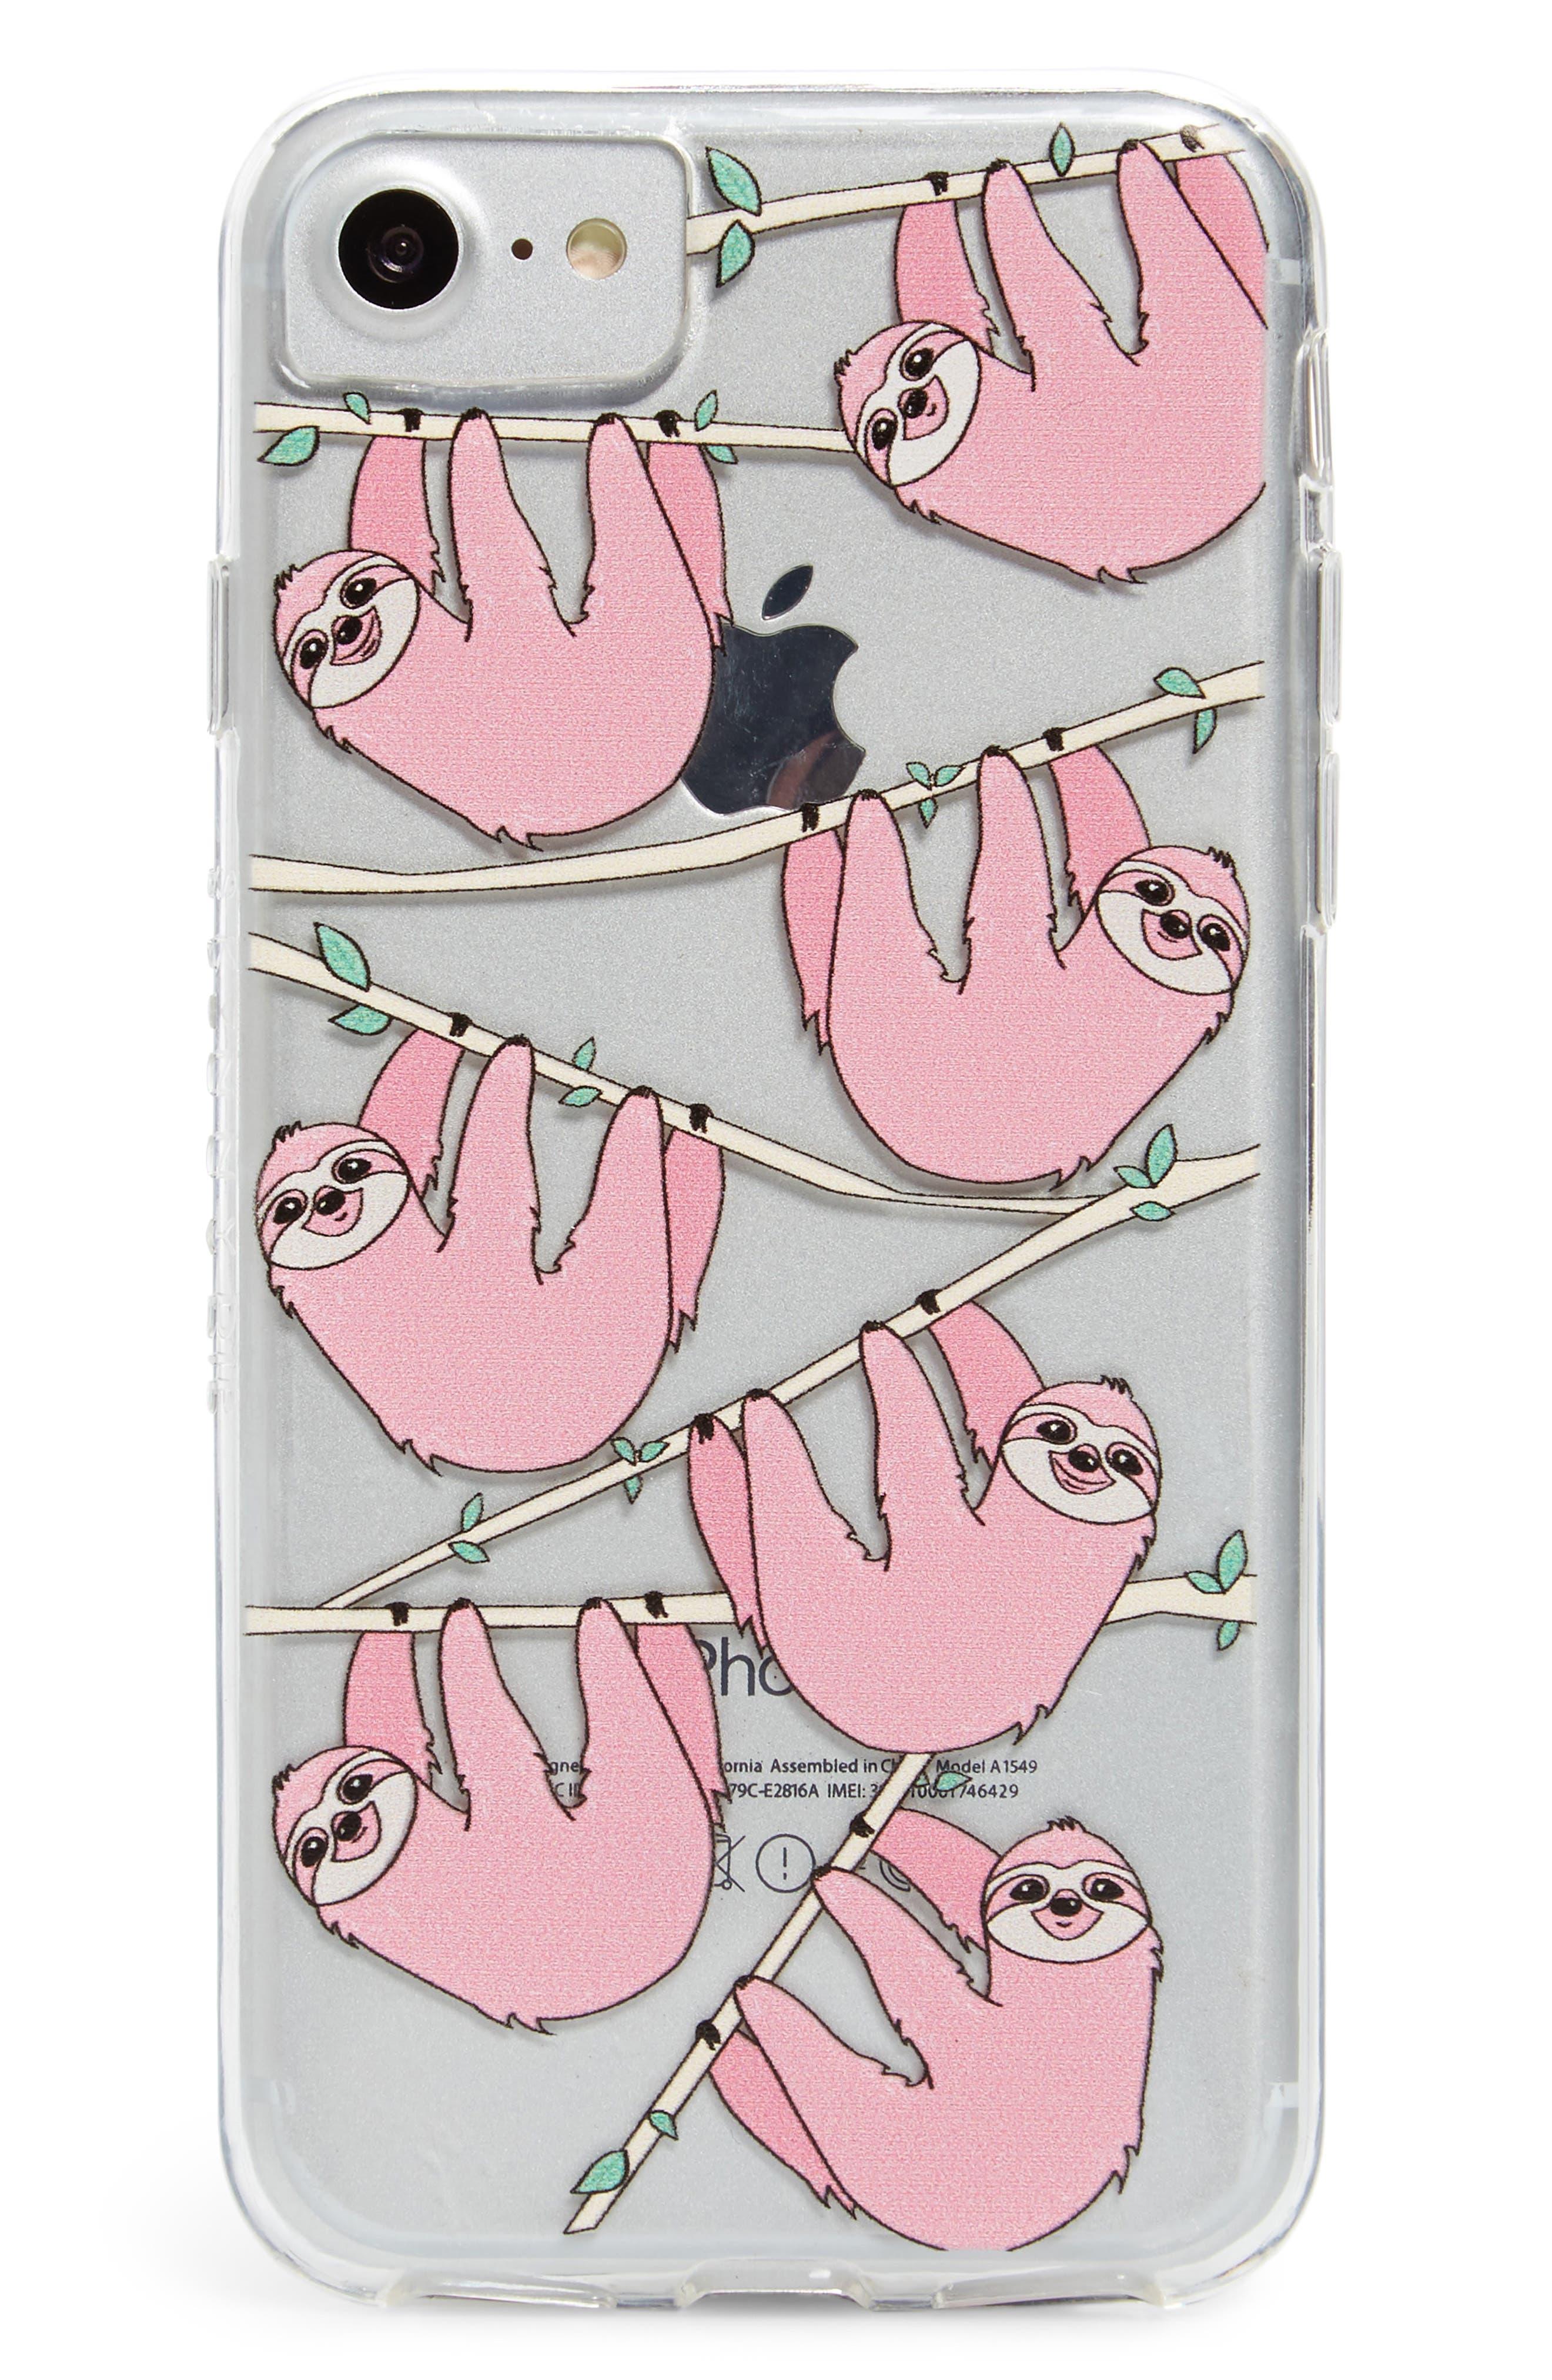 Main Image - Skinny Dip Sloth iPhone 6/6s/7/8 & 6/6s/7/8 Plus Case